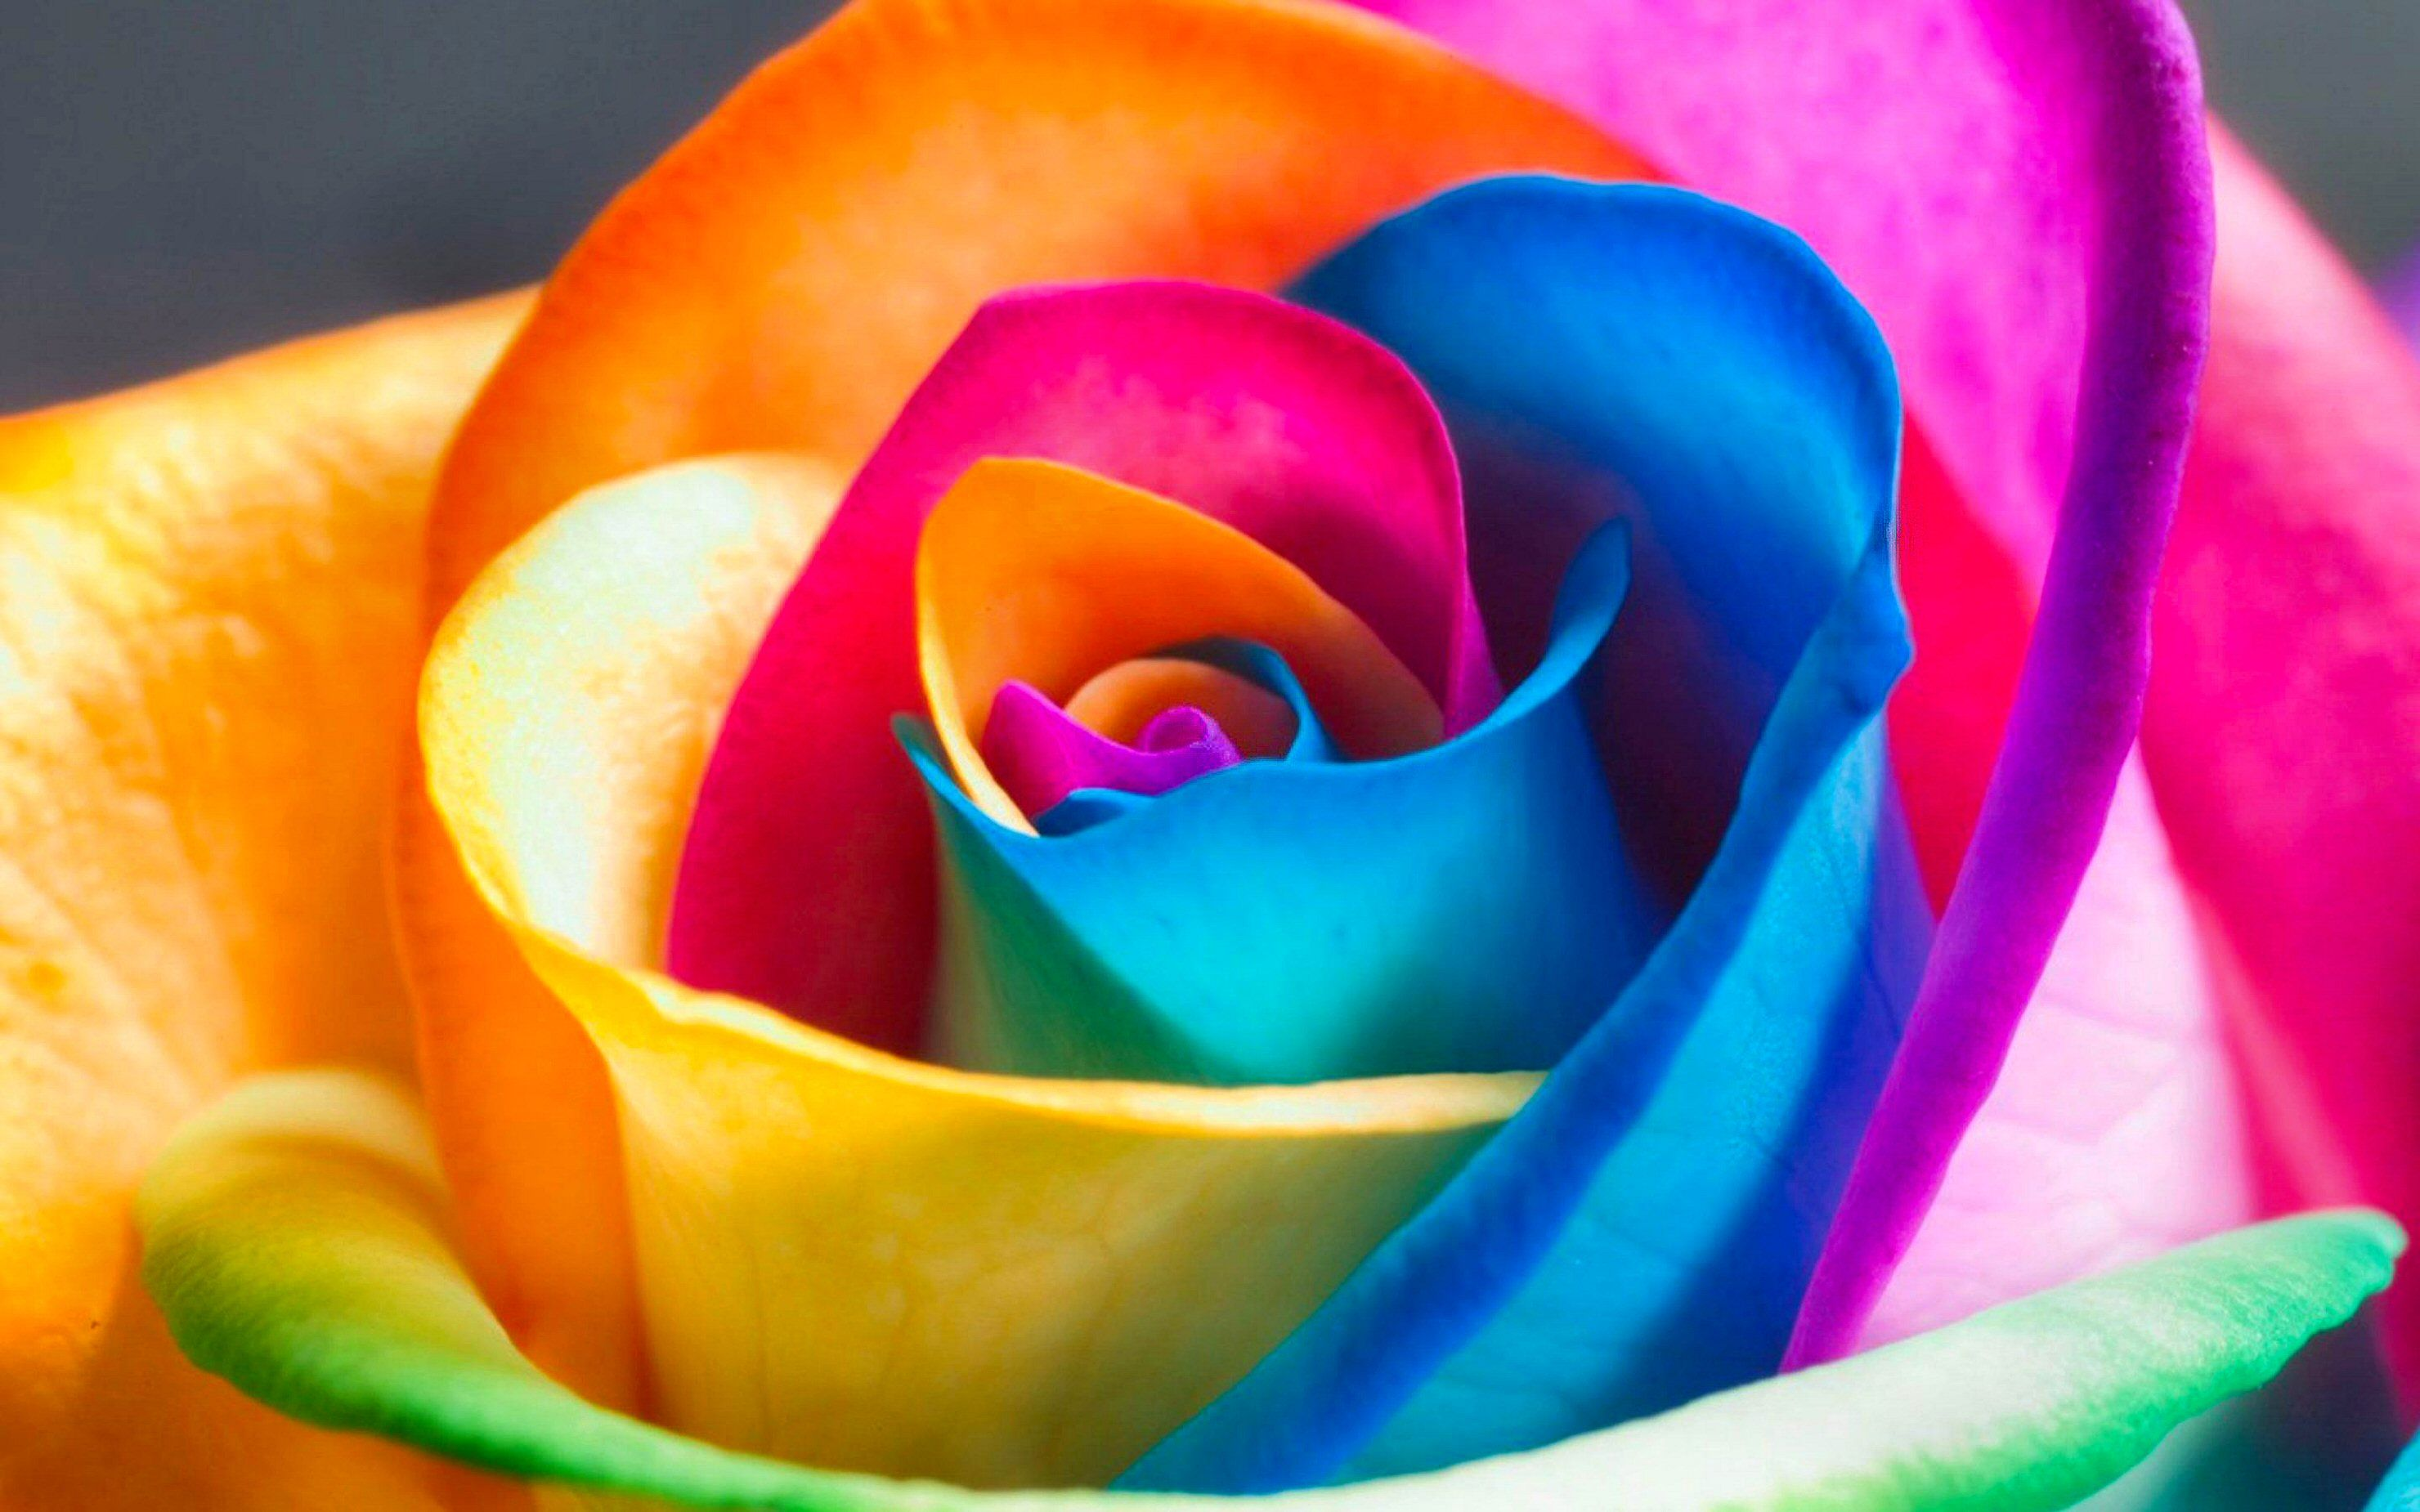 Colorful Wallpaper 011 - [2960x1850]